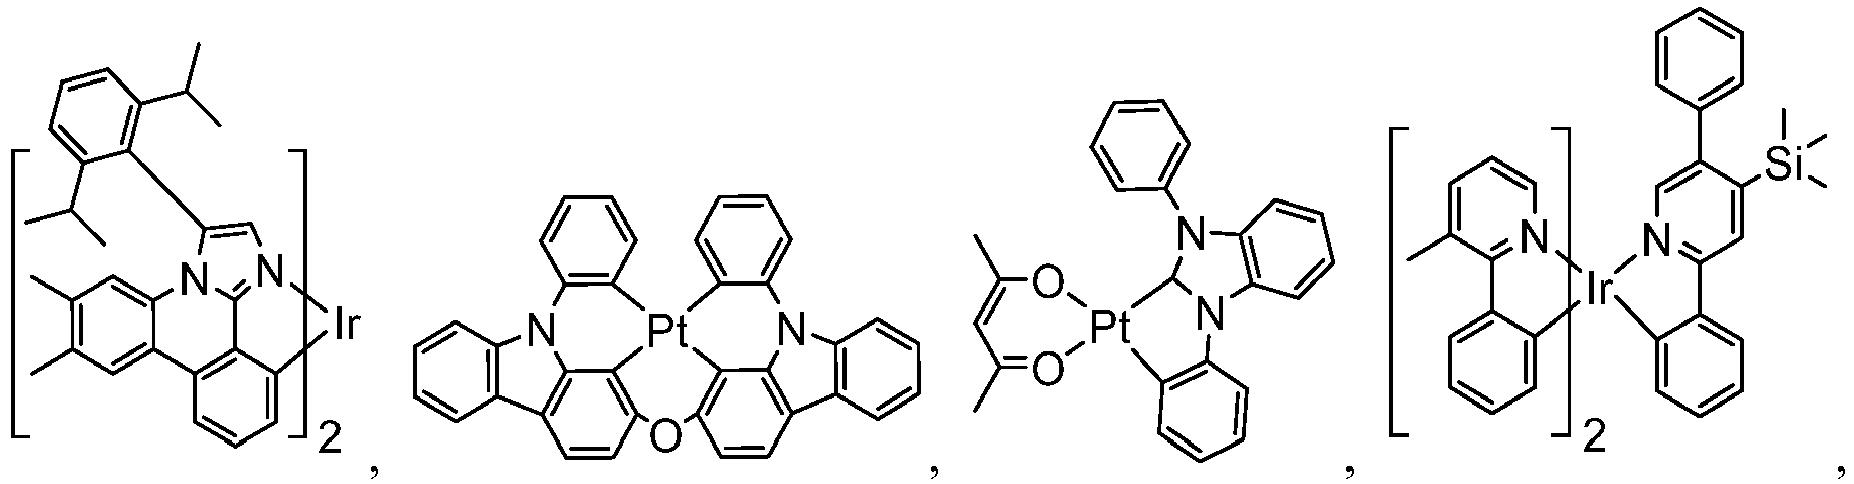 Figure imgb0922